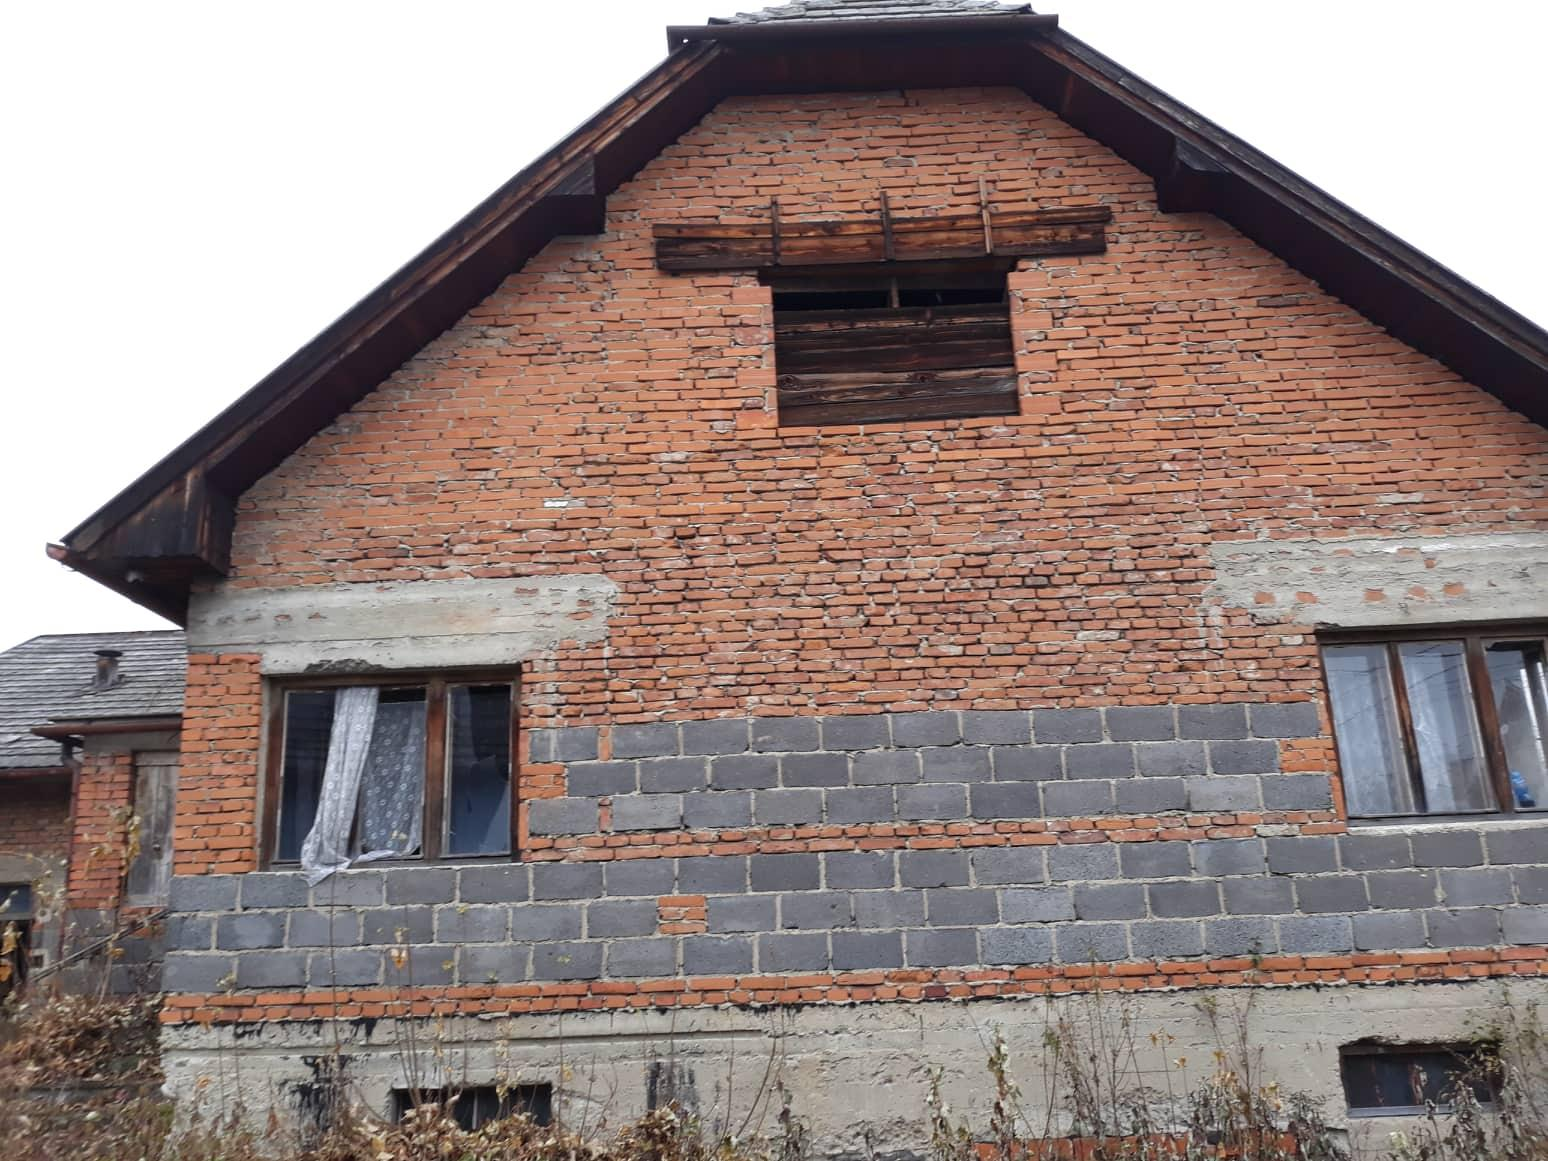 Rekonštrukcia domu-alebo chceme si splniť sen =》🏠🌻🌼🐶  mat domcek a vratit sa na Slovensko - pohlad z dvora z lavej strany na izbu c.2 a na pravej strane izba c.1